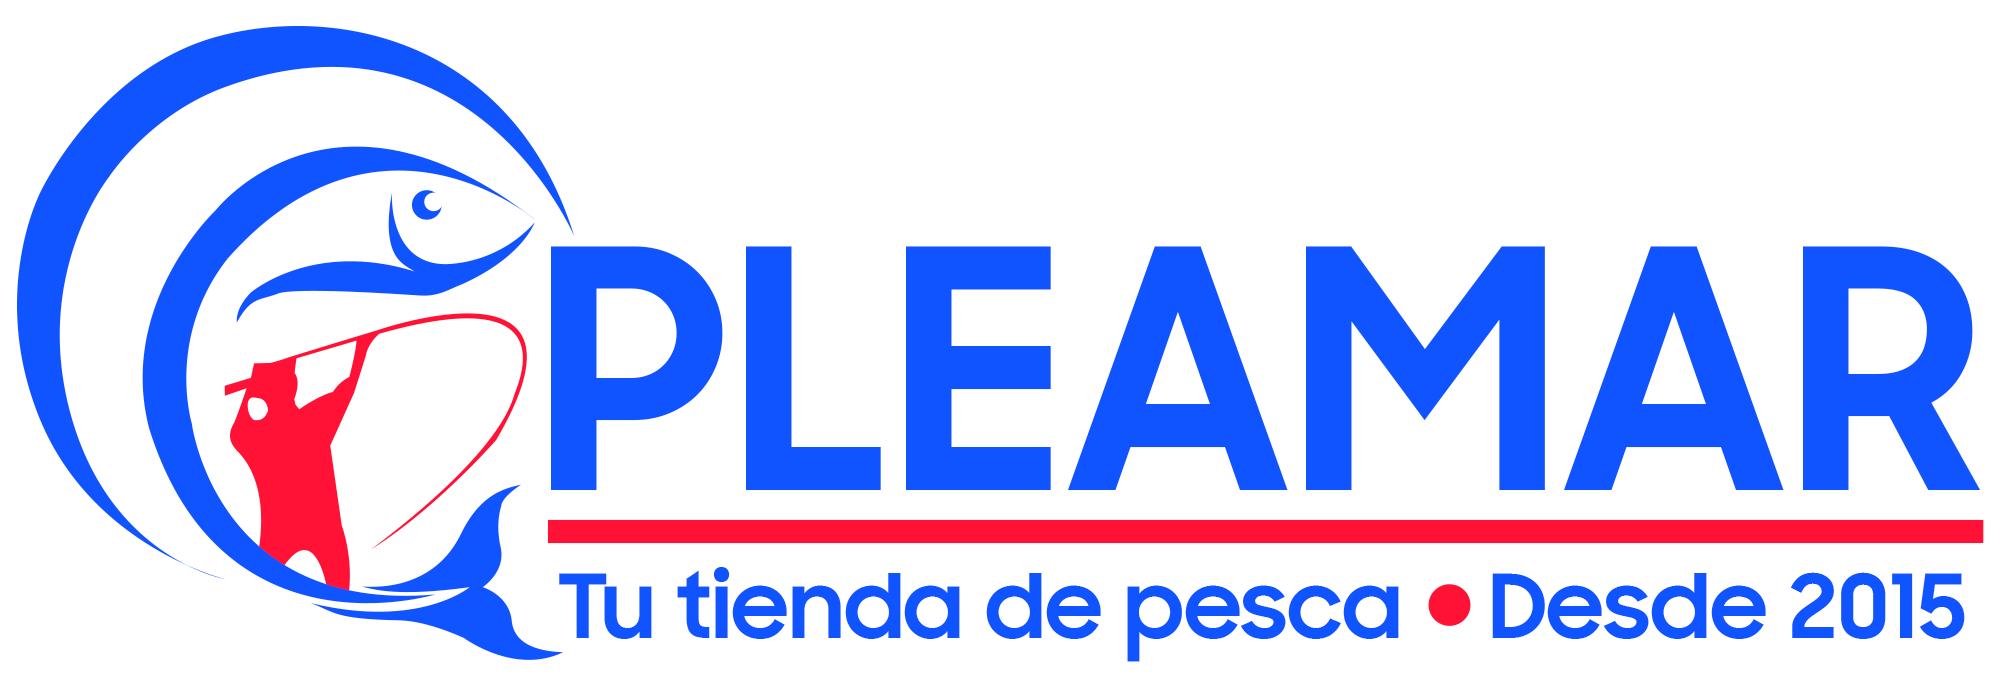 LOGO-COMPLETO-FONDO-BLANCO